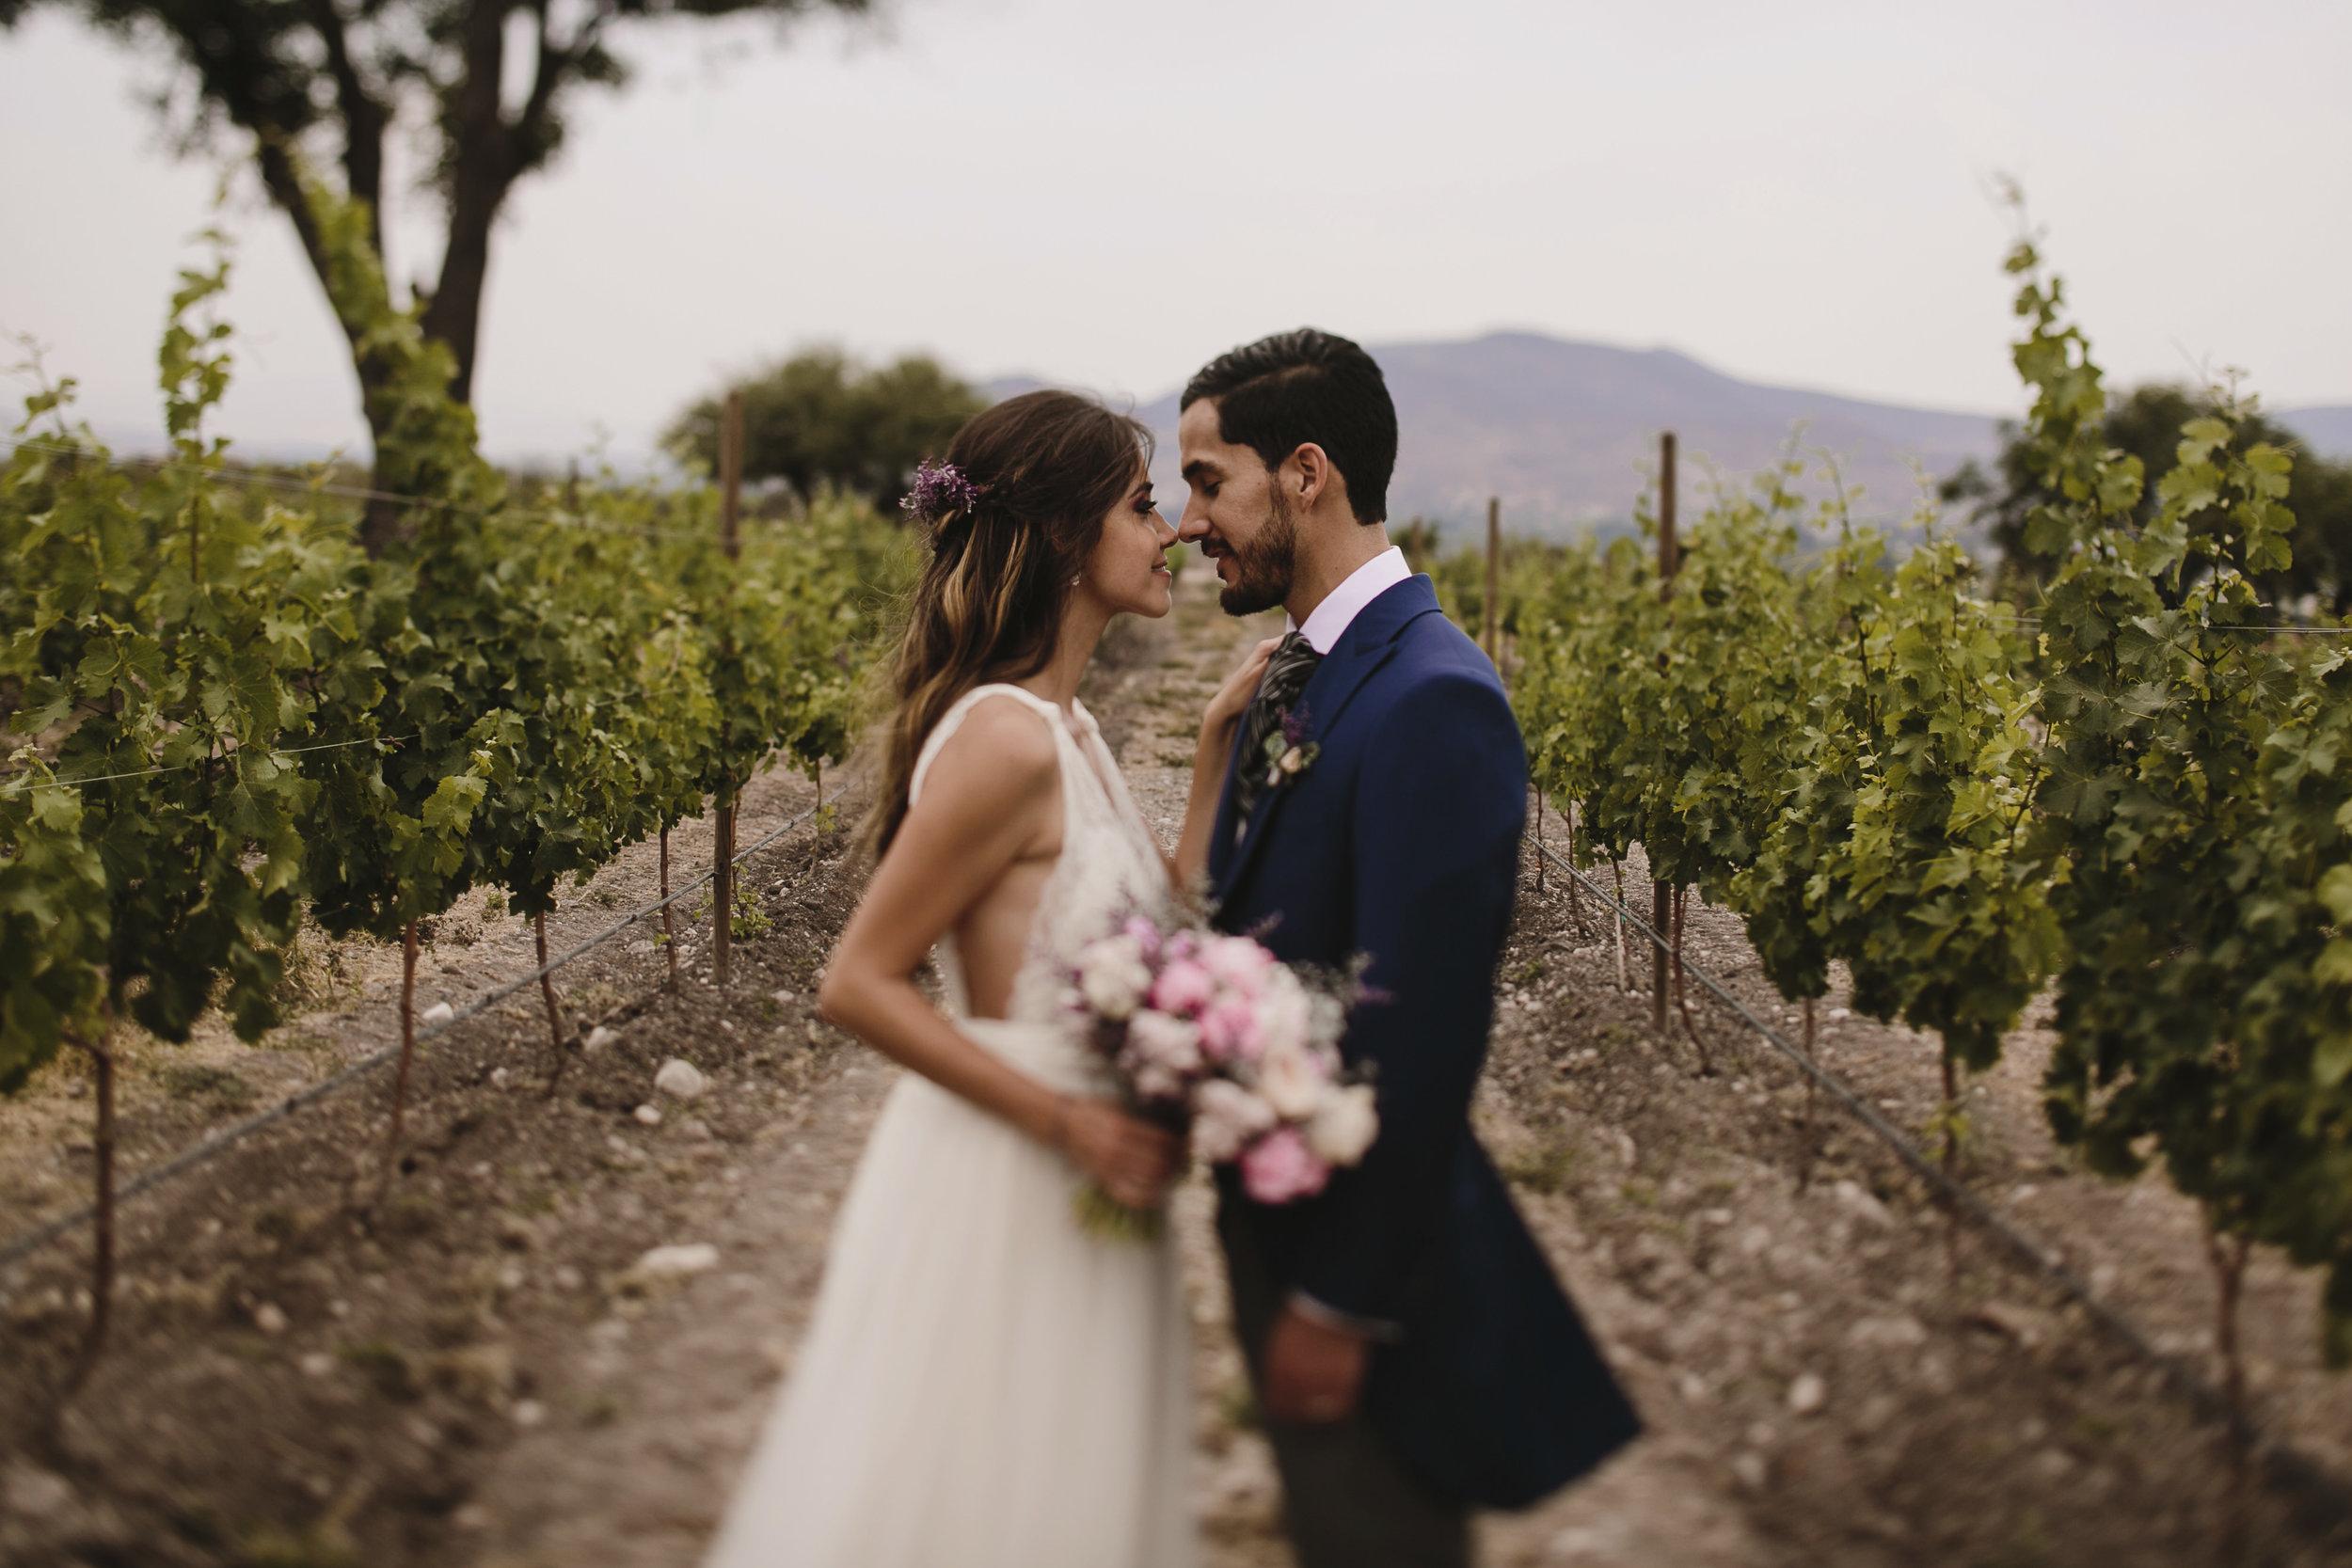 alfons_flores_destination_wedding_photography_mavi_david-1271.JPG